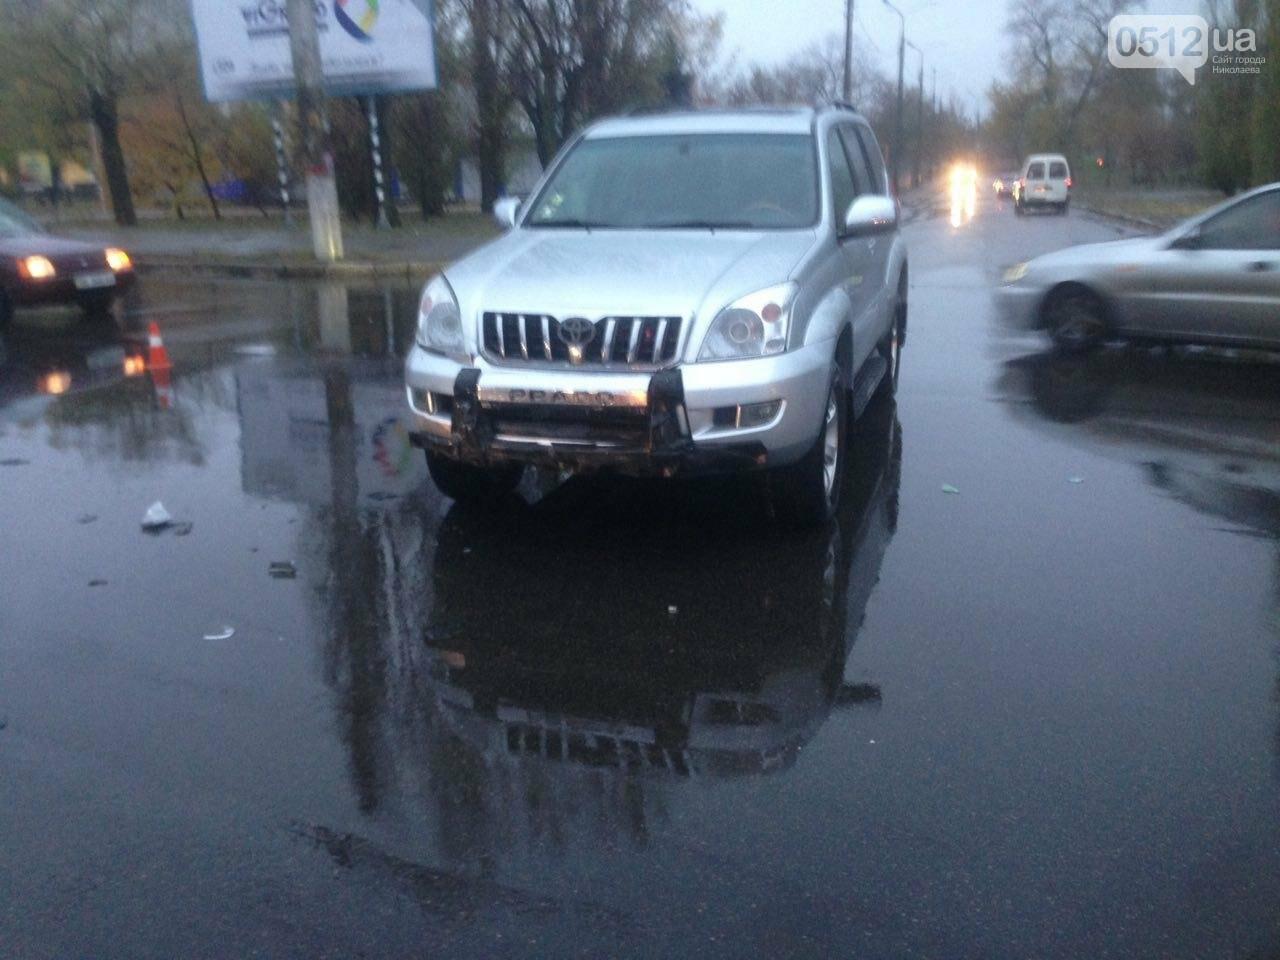 Возле спортшколы Надежда в Николаеве столкнулись Toyota и Subaru, - ФОТО , фото-2